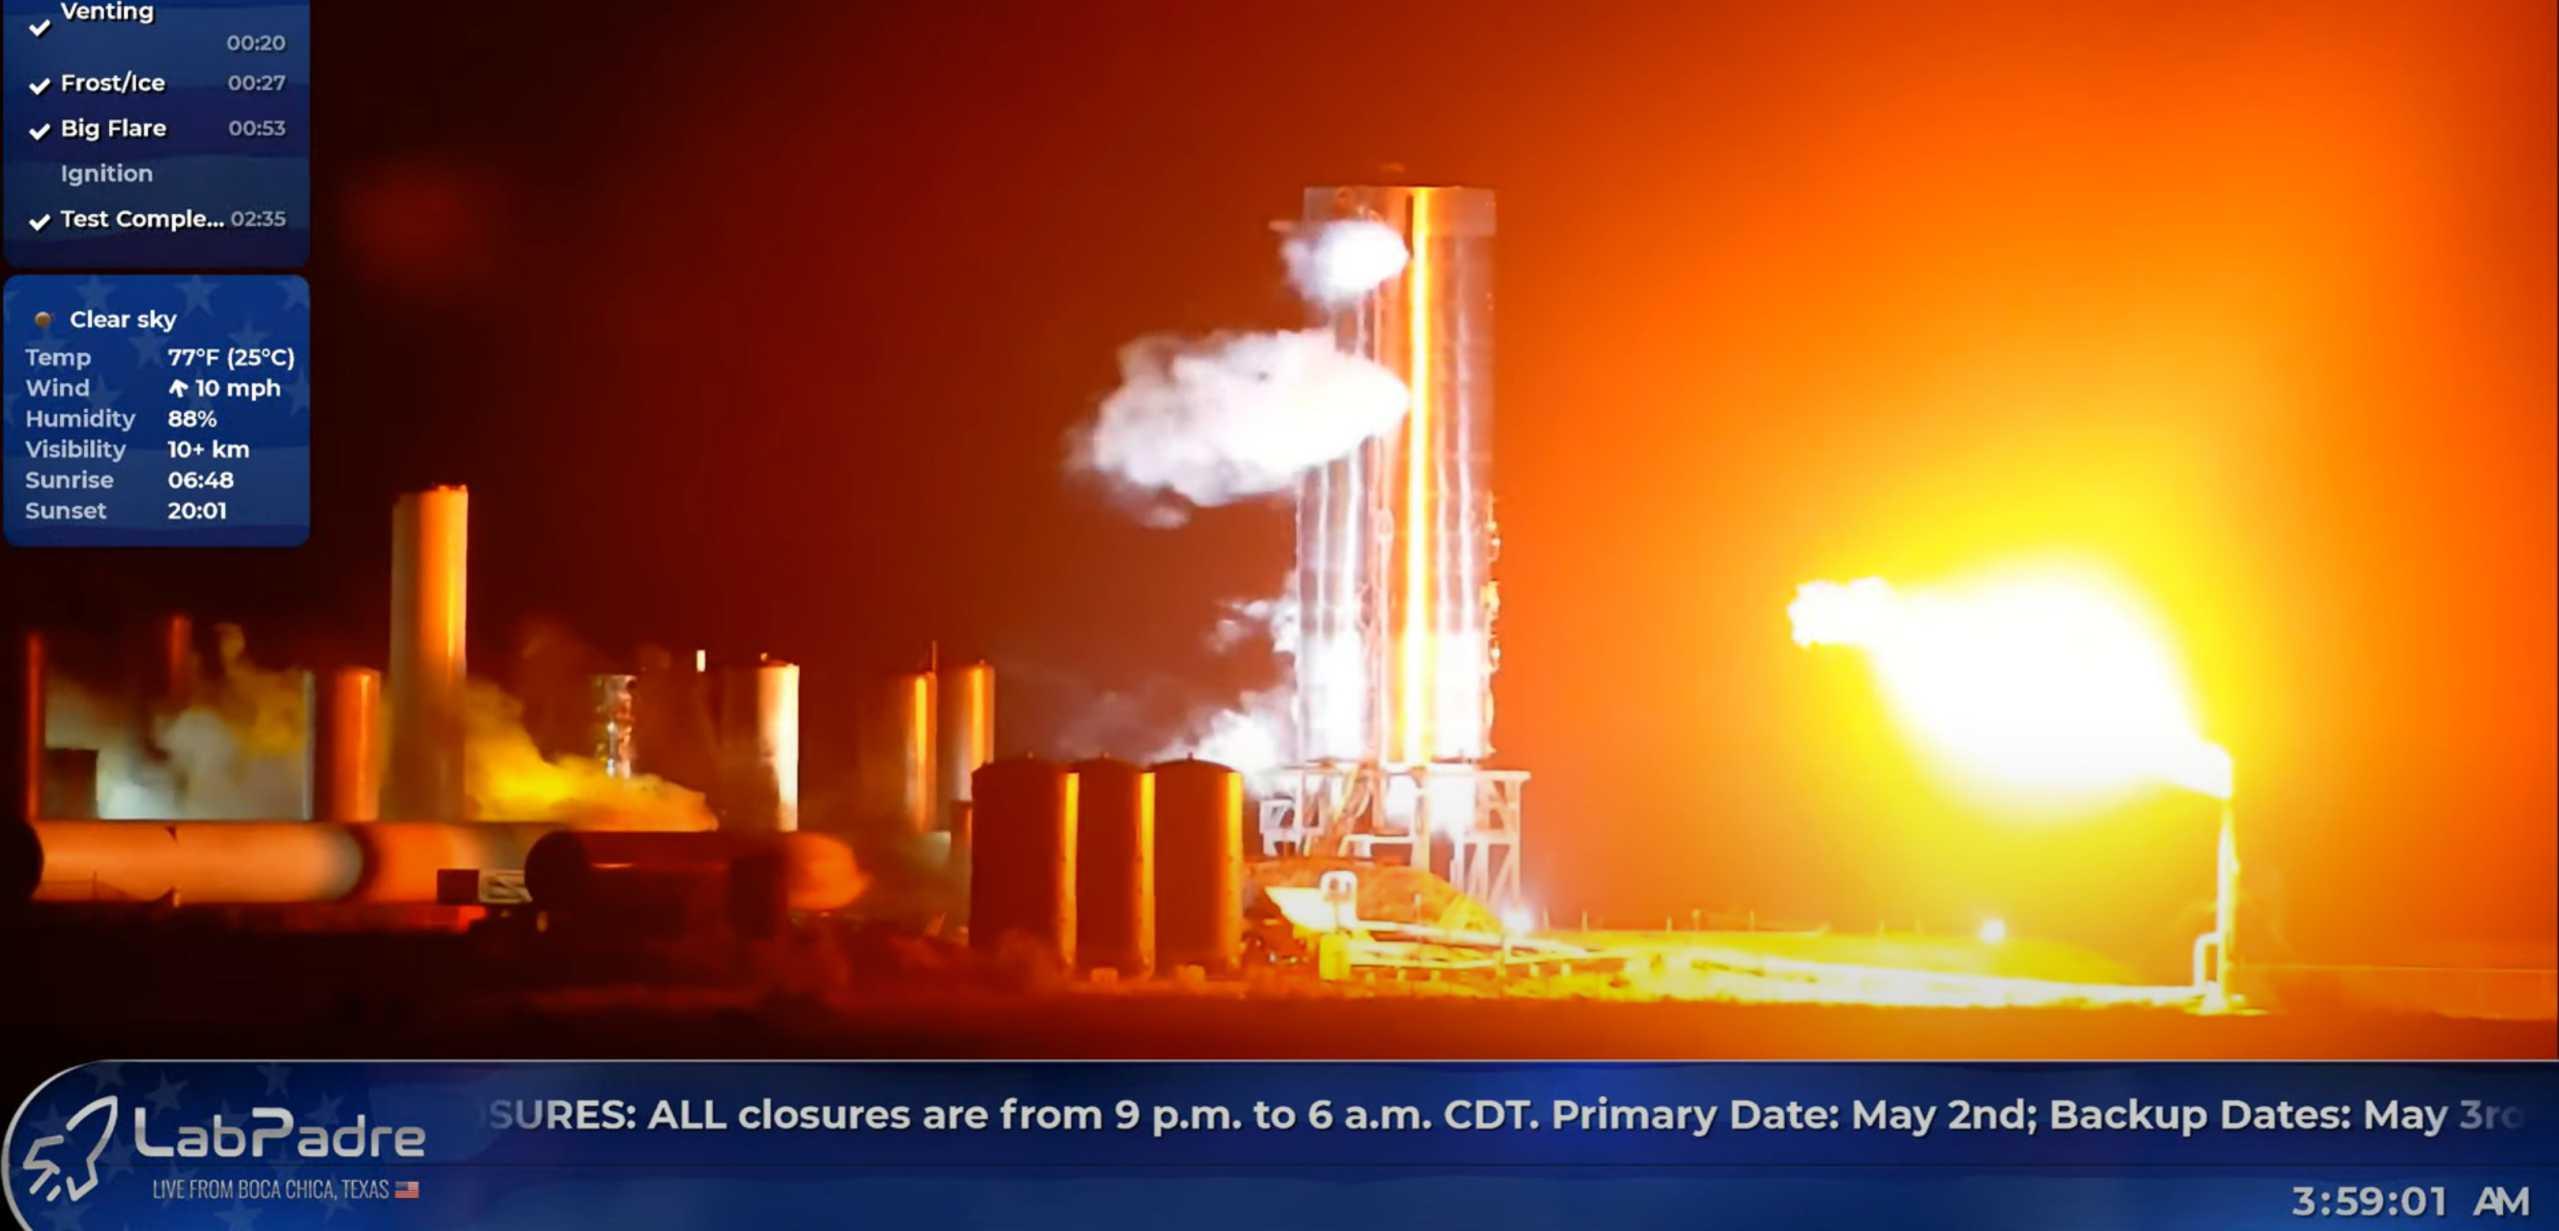 Starship Boca Chica 050420 (LabPadre) SN4 WDR take2 3 (c)